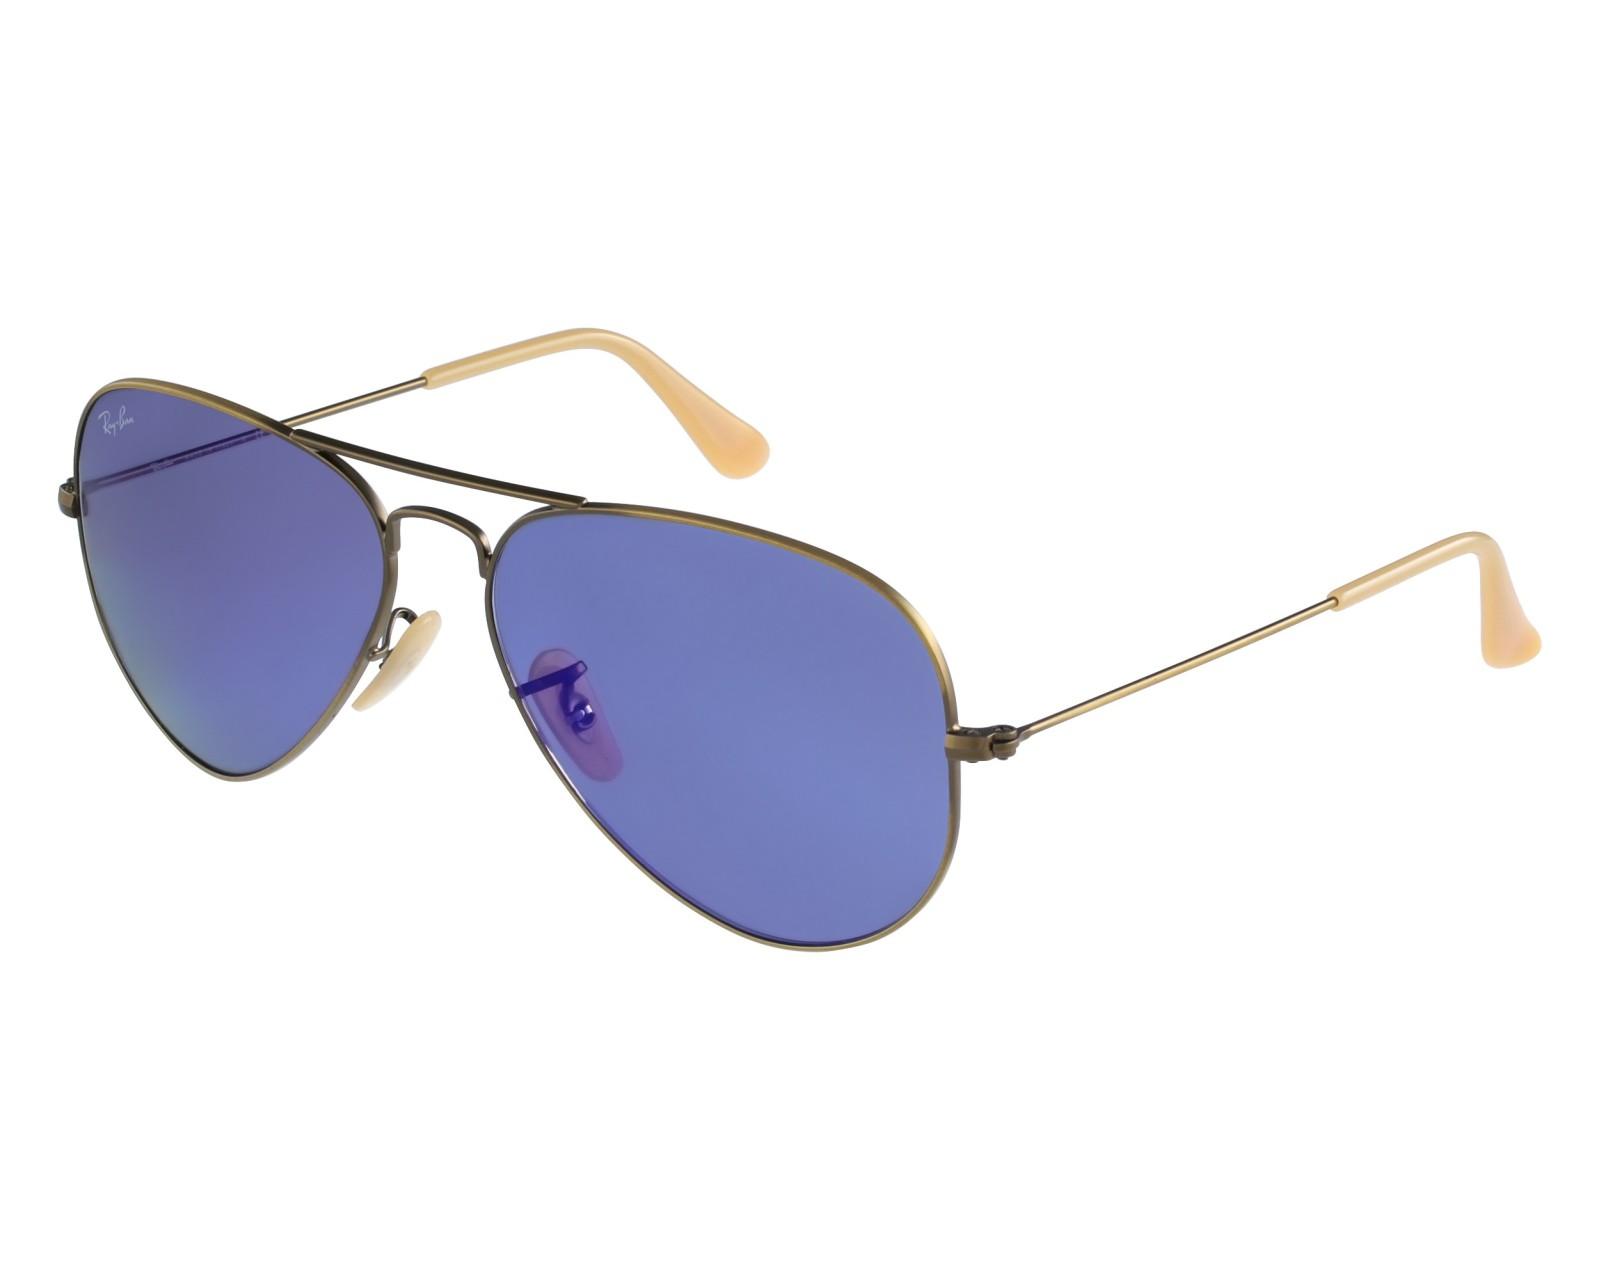 Sunglasses Ray-Ban RB-3025 167 68 58-14 Bronze Beige front 995bea39393e